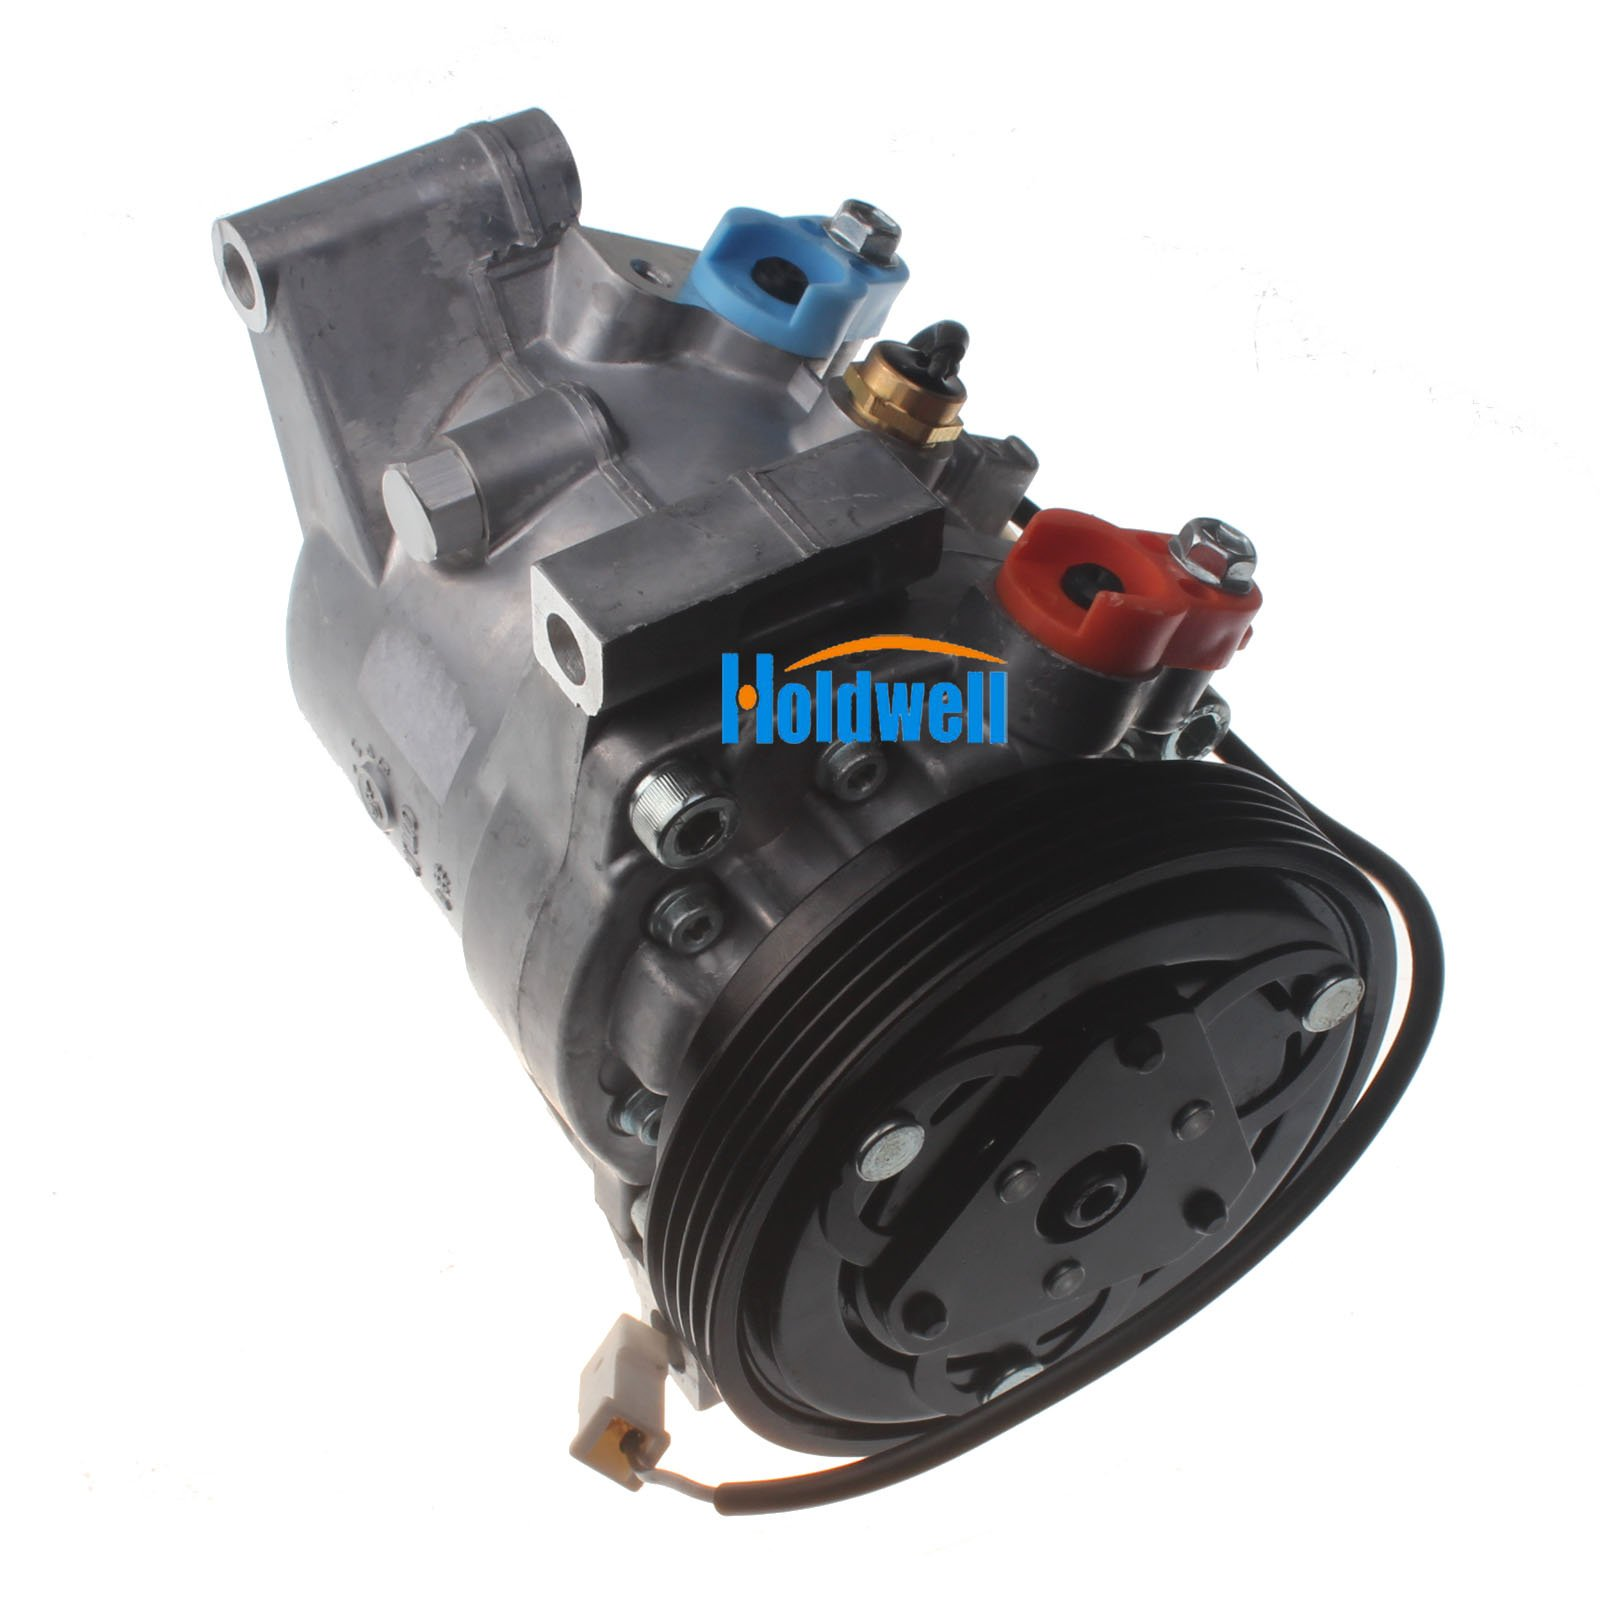 Holdwell Auto AC Compressor 95201-77GB2 9520177GB2 for Suzuki Jimny Seiko Seiki SS07LK10 by Holdwell (Image #1)